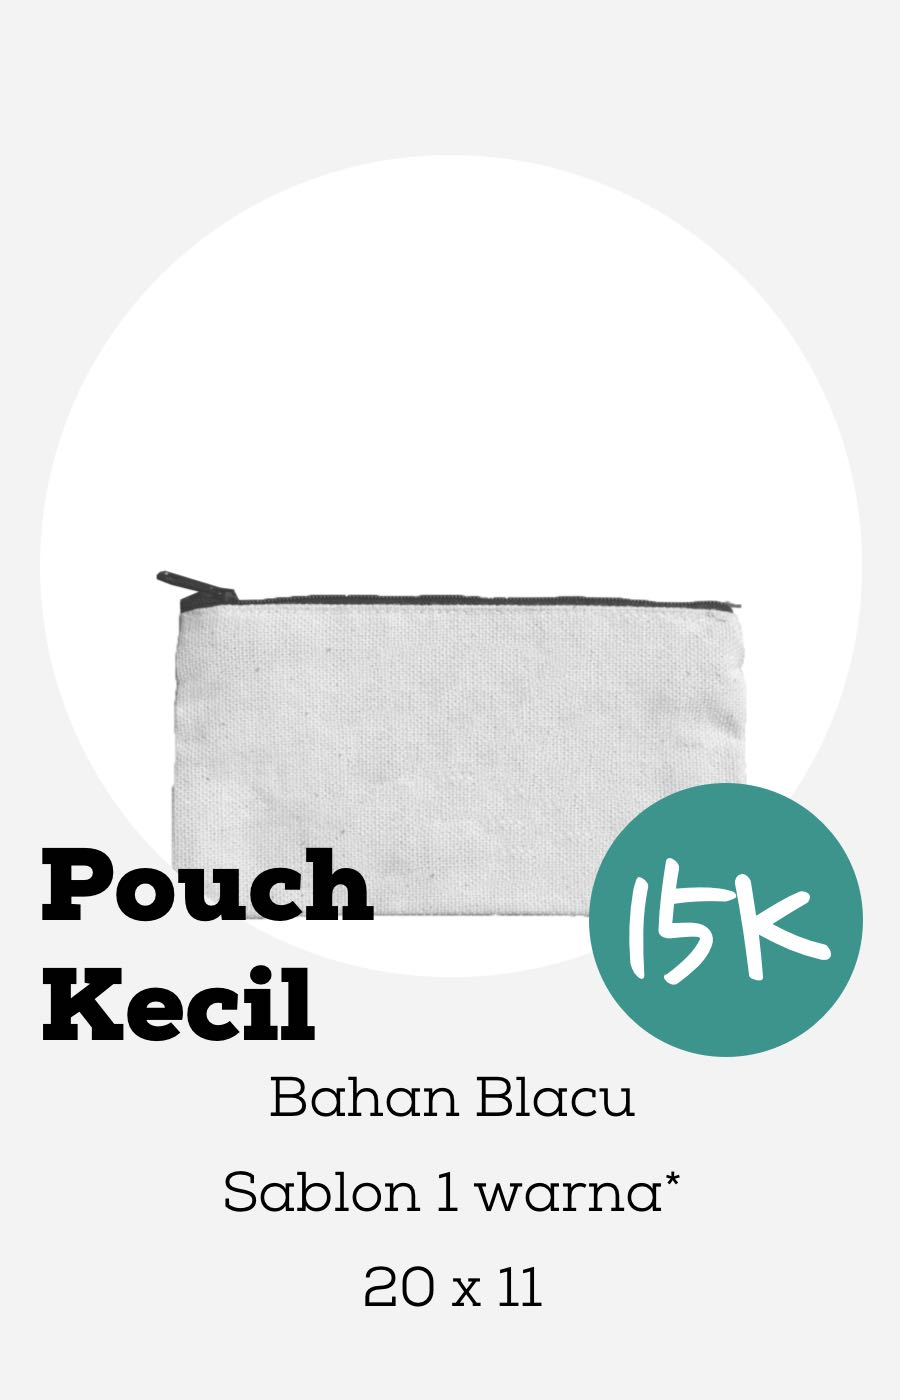 Pouch Kecil Reservedmerch.jpg